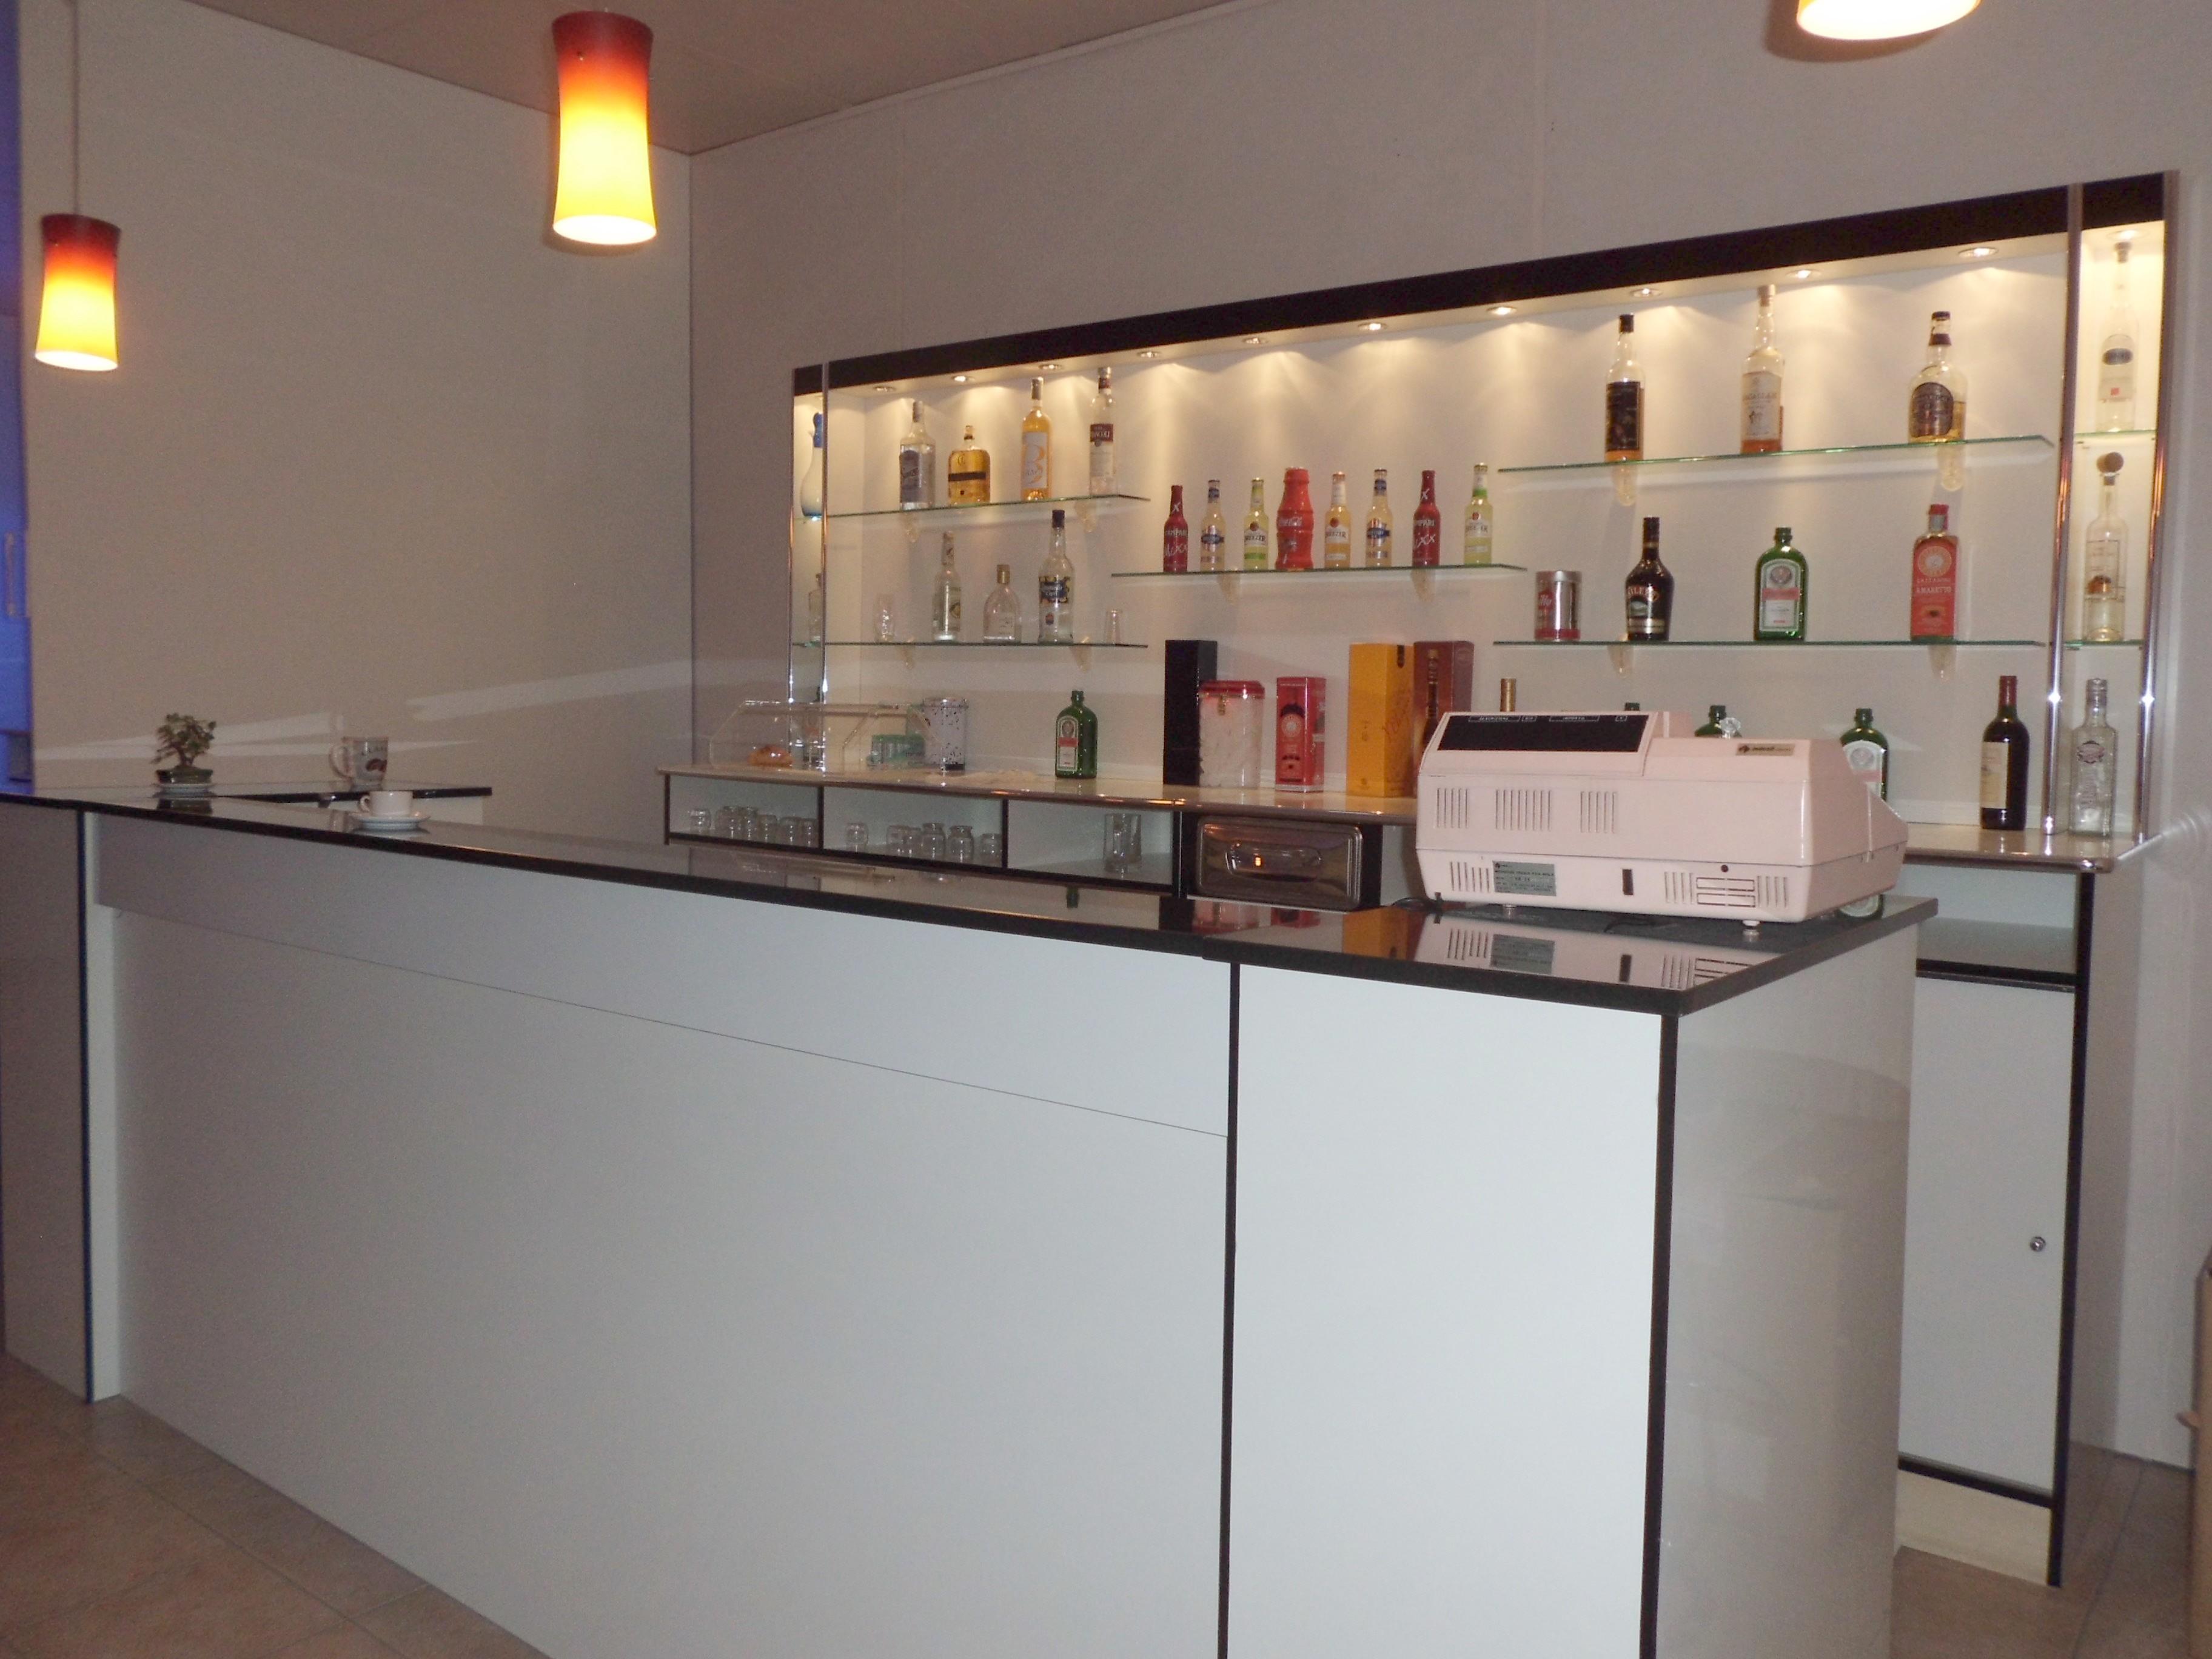 Banconi bar in promozione banchi frigo banconi bar for Banconi bar usati prezzi